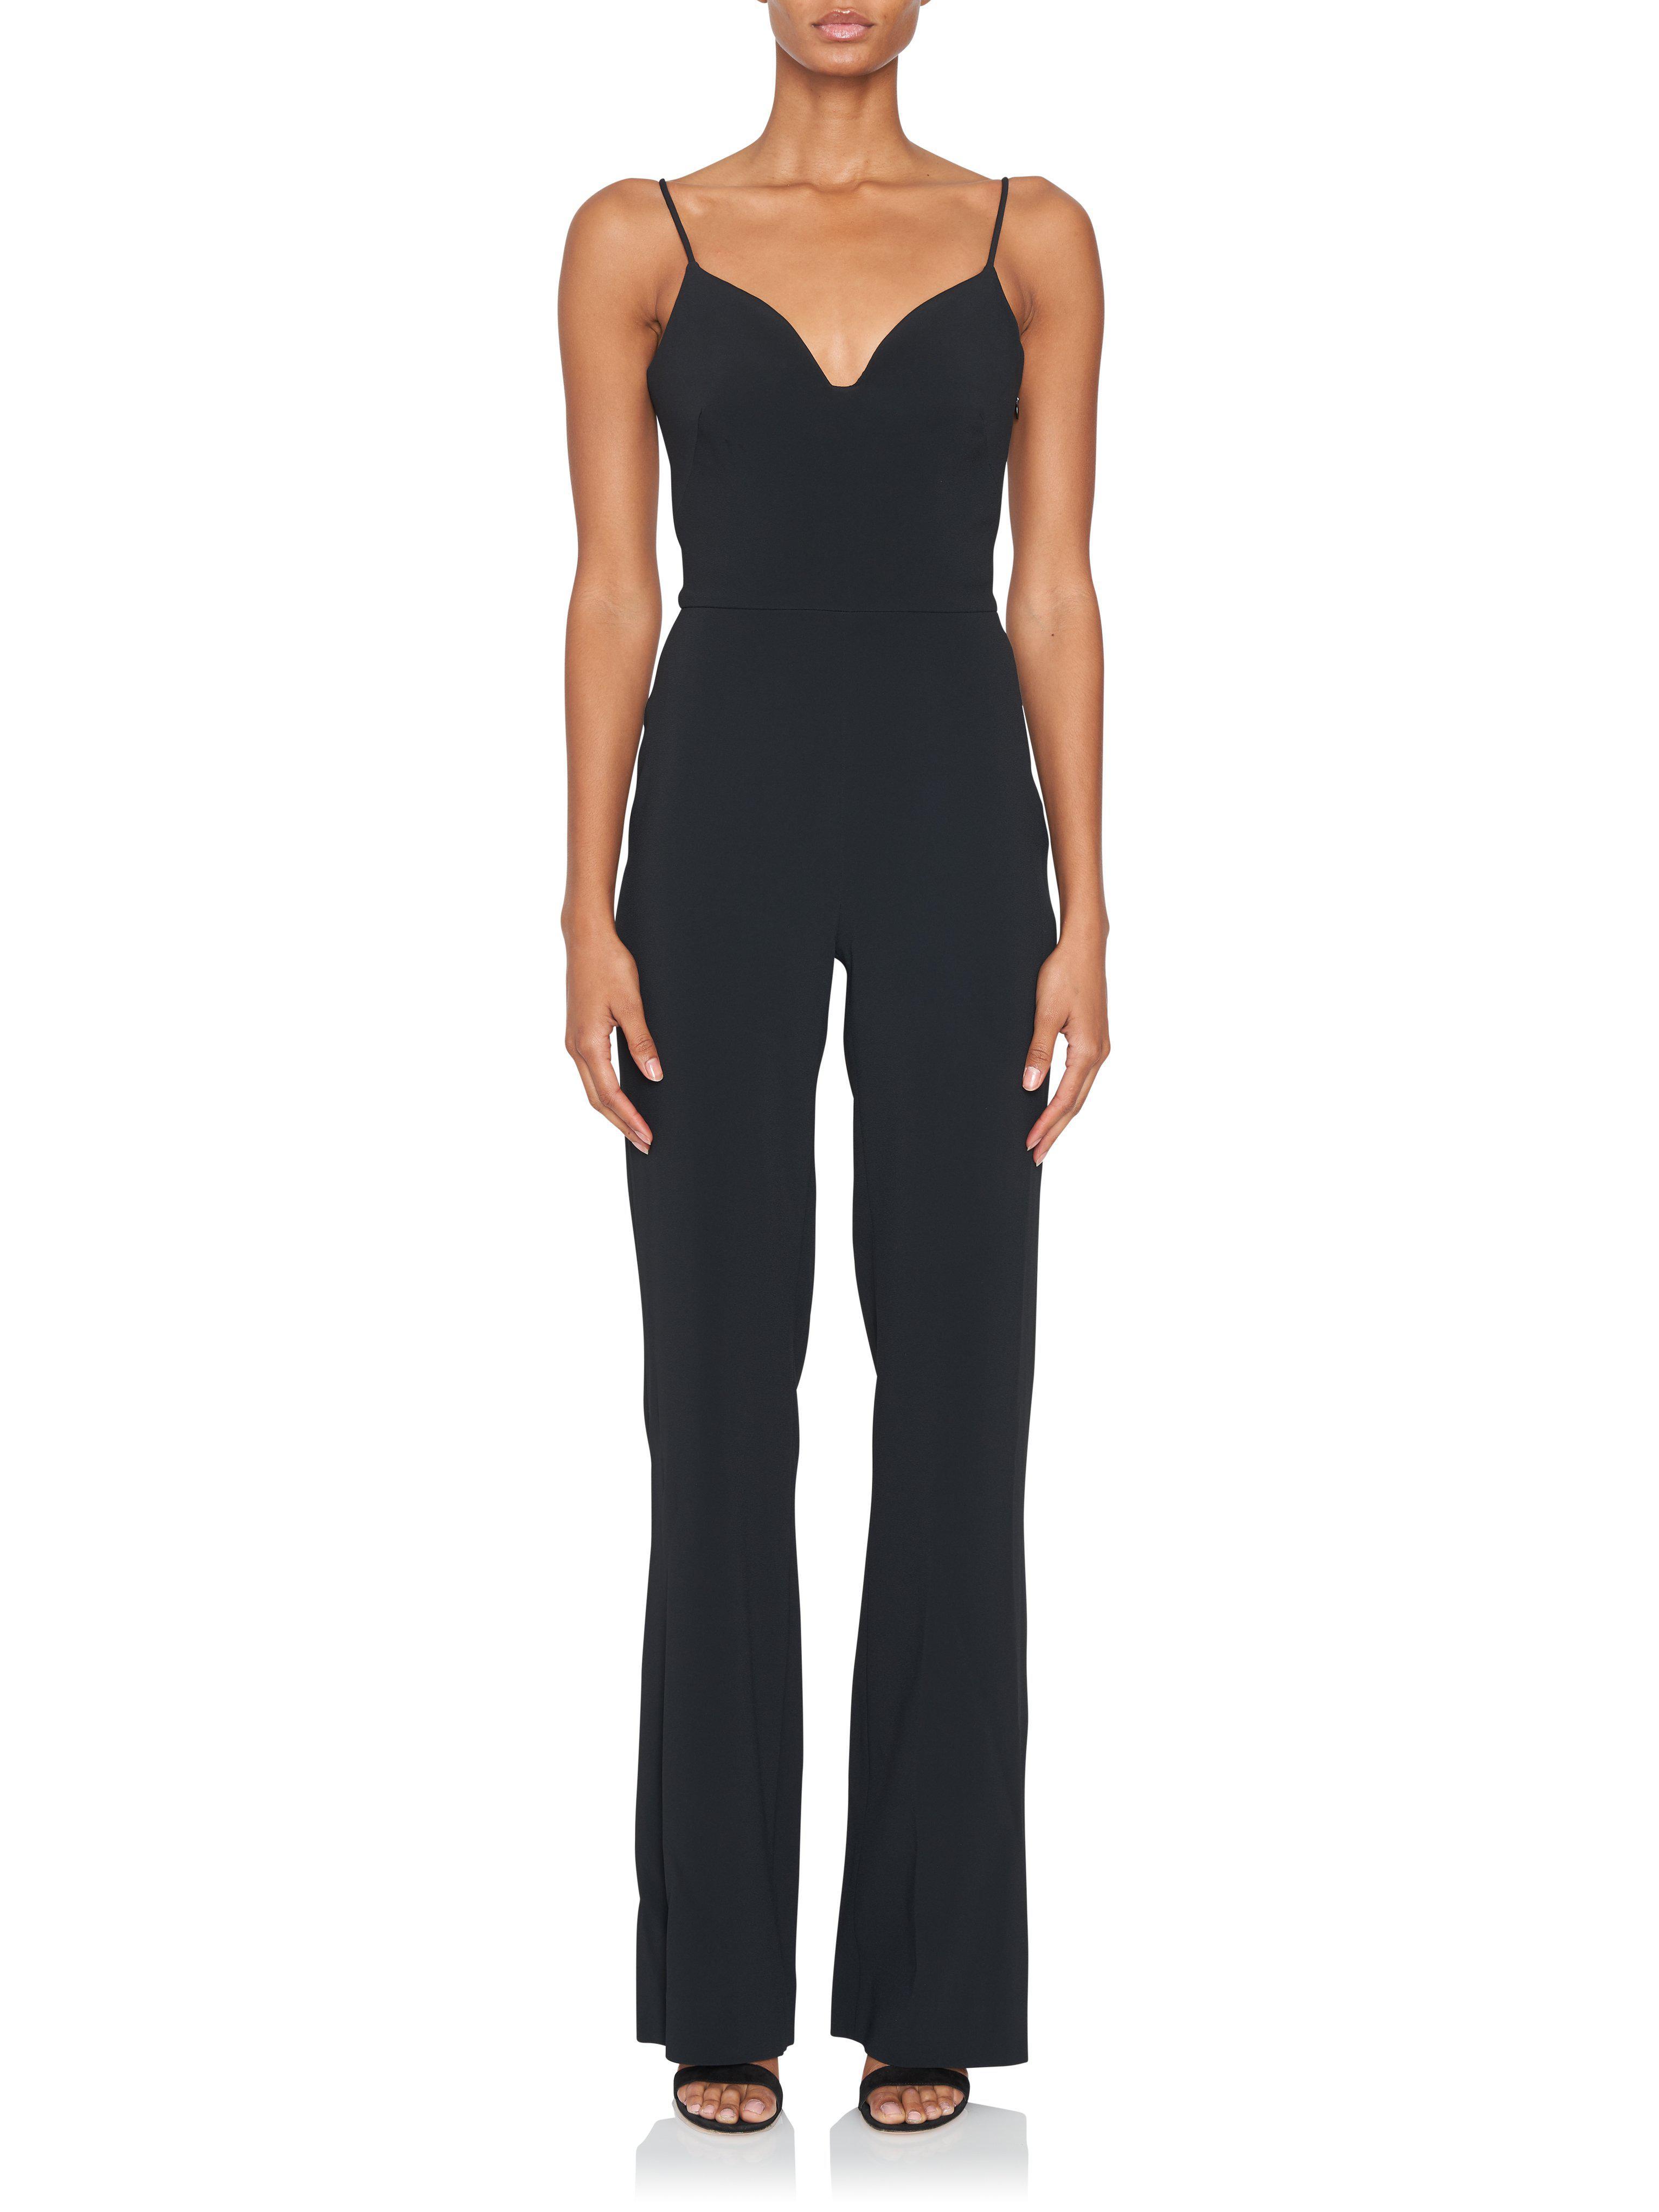 04dd8d35c2b Lyst - Brandon Maxwell Black Sweetheart Neckline Jumpsuit in Black